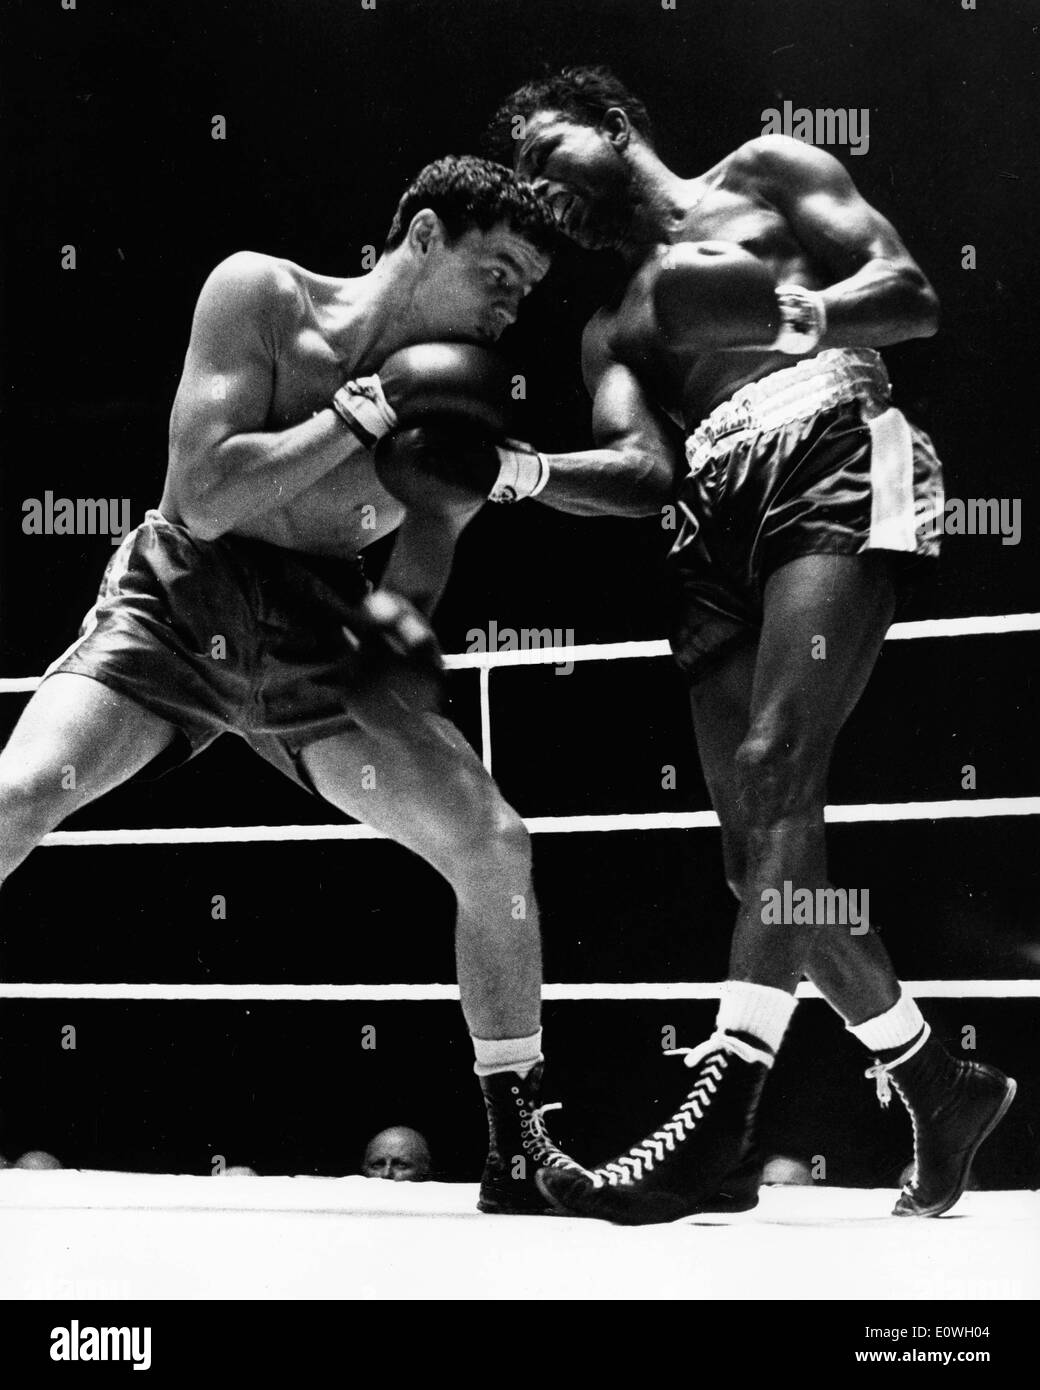 Boxer 'Sugar' Ray Robinson fighting Terry Downes at Wembley - Stock Image